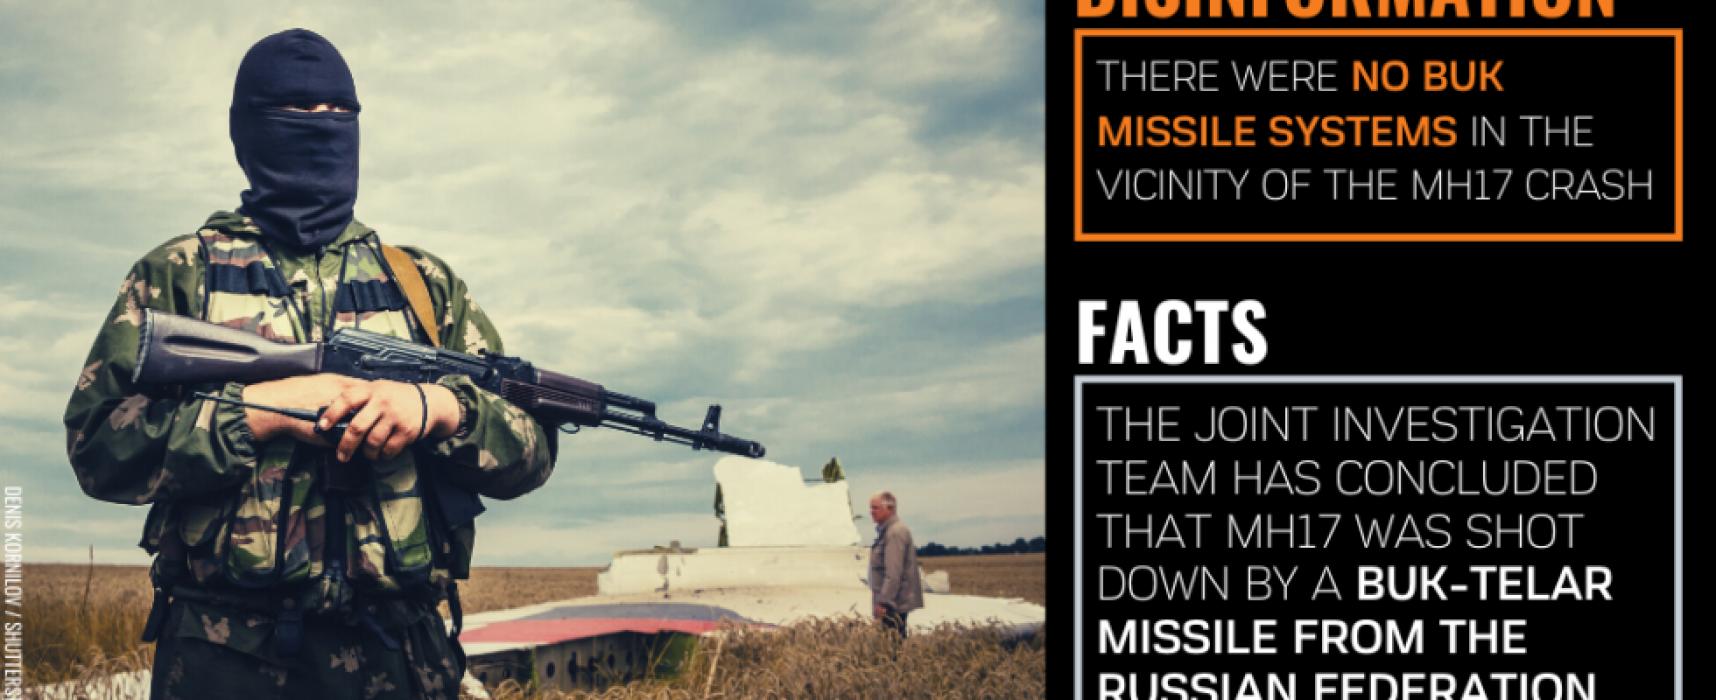 Pro-Kremlin disinformation desperation: MH17 and WWII